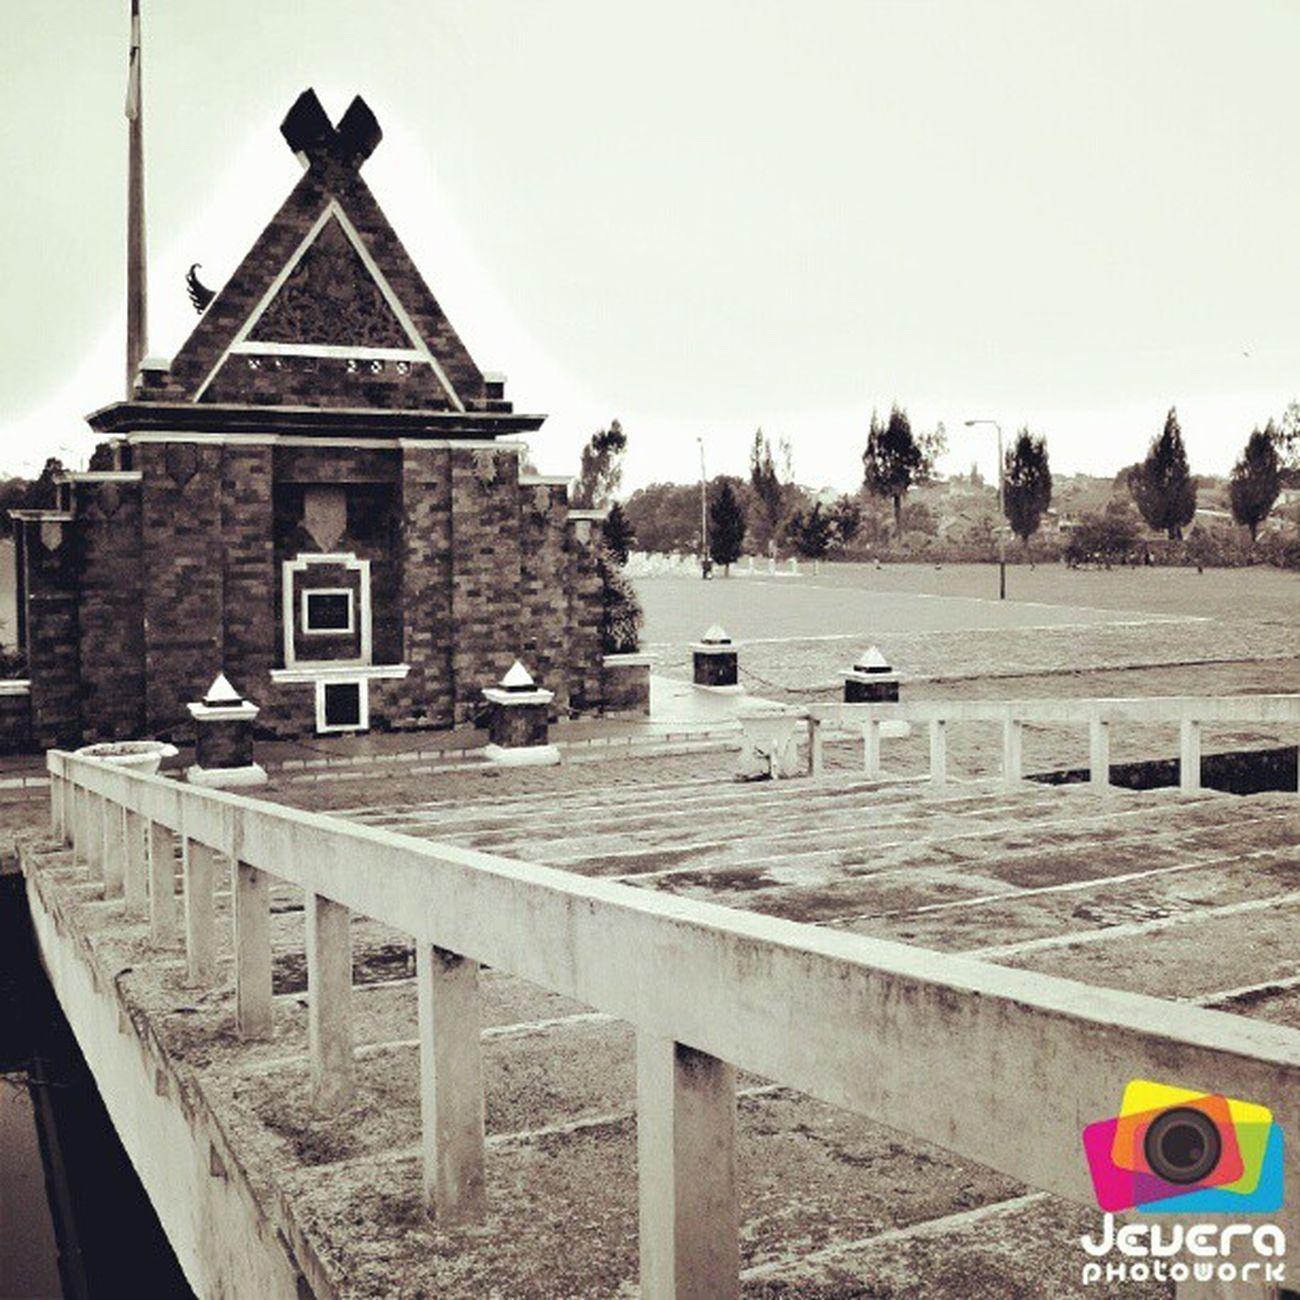 Taman Makam Pahlawan (Cikutra, Bandung) Makan Pahlawan Cikutra Bandung WestJava Indonesia FadeyJevera BlackAndWhite Sephia Tomb FadeyJevera